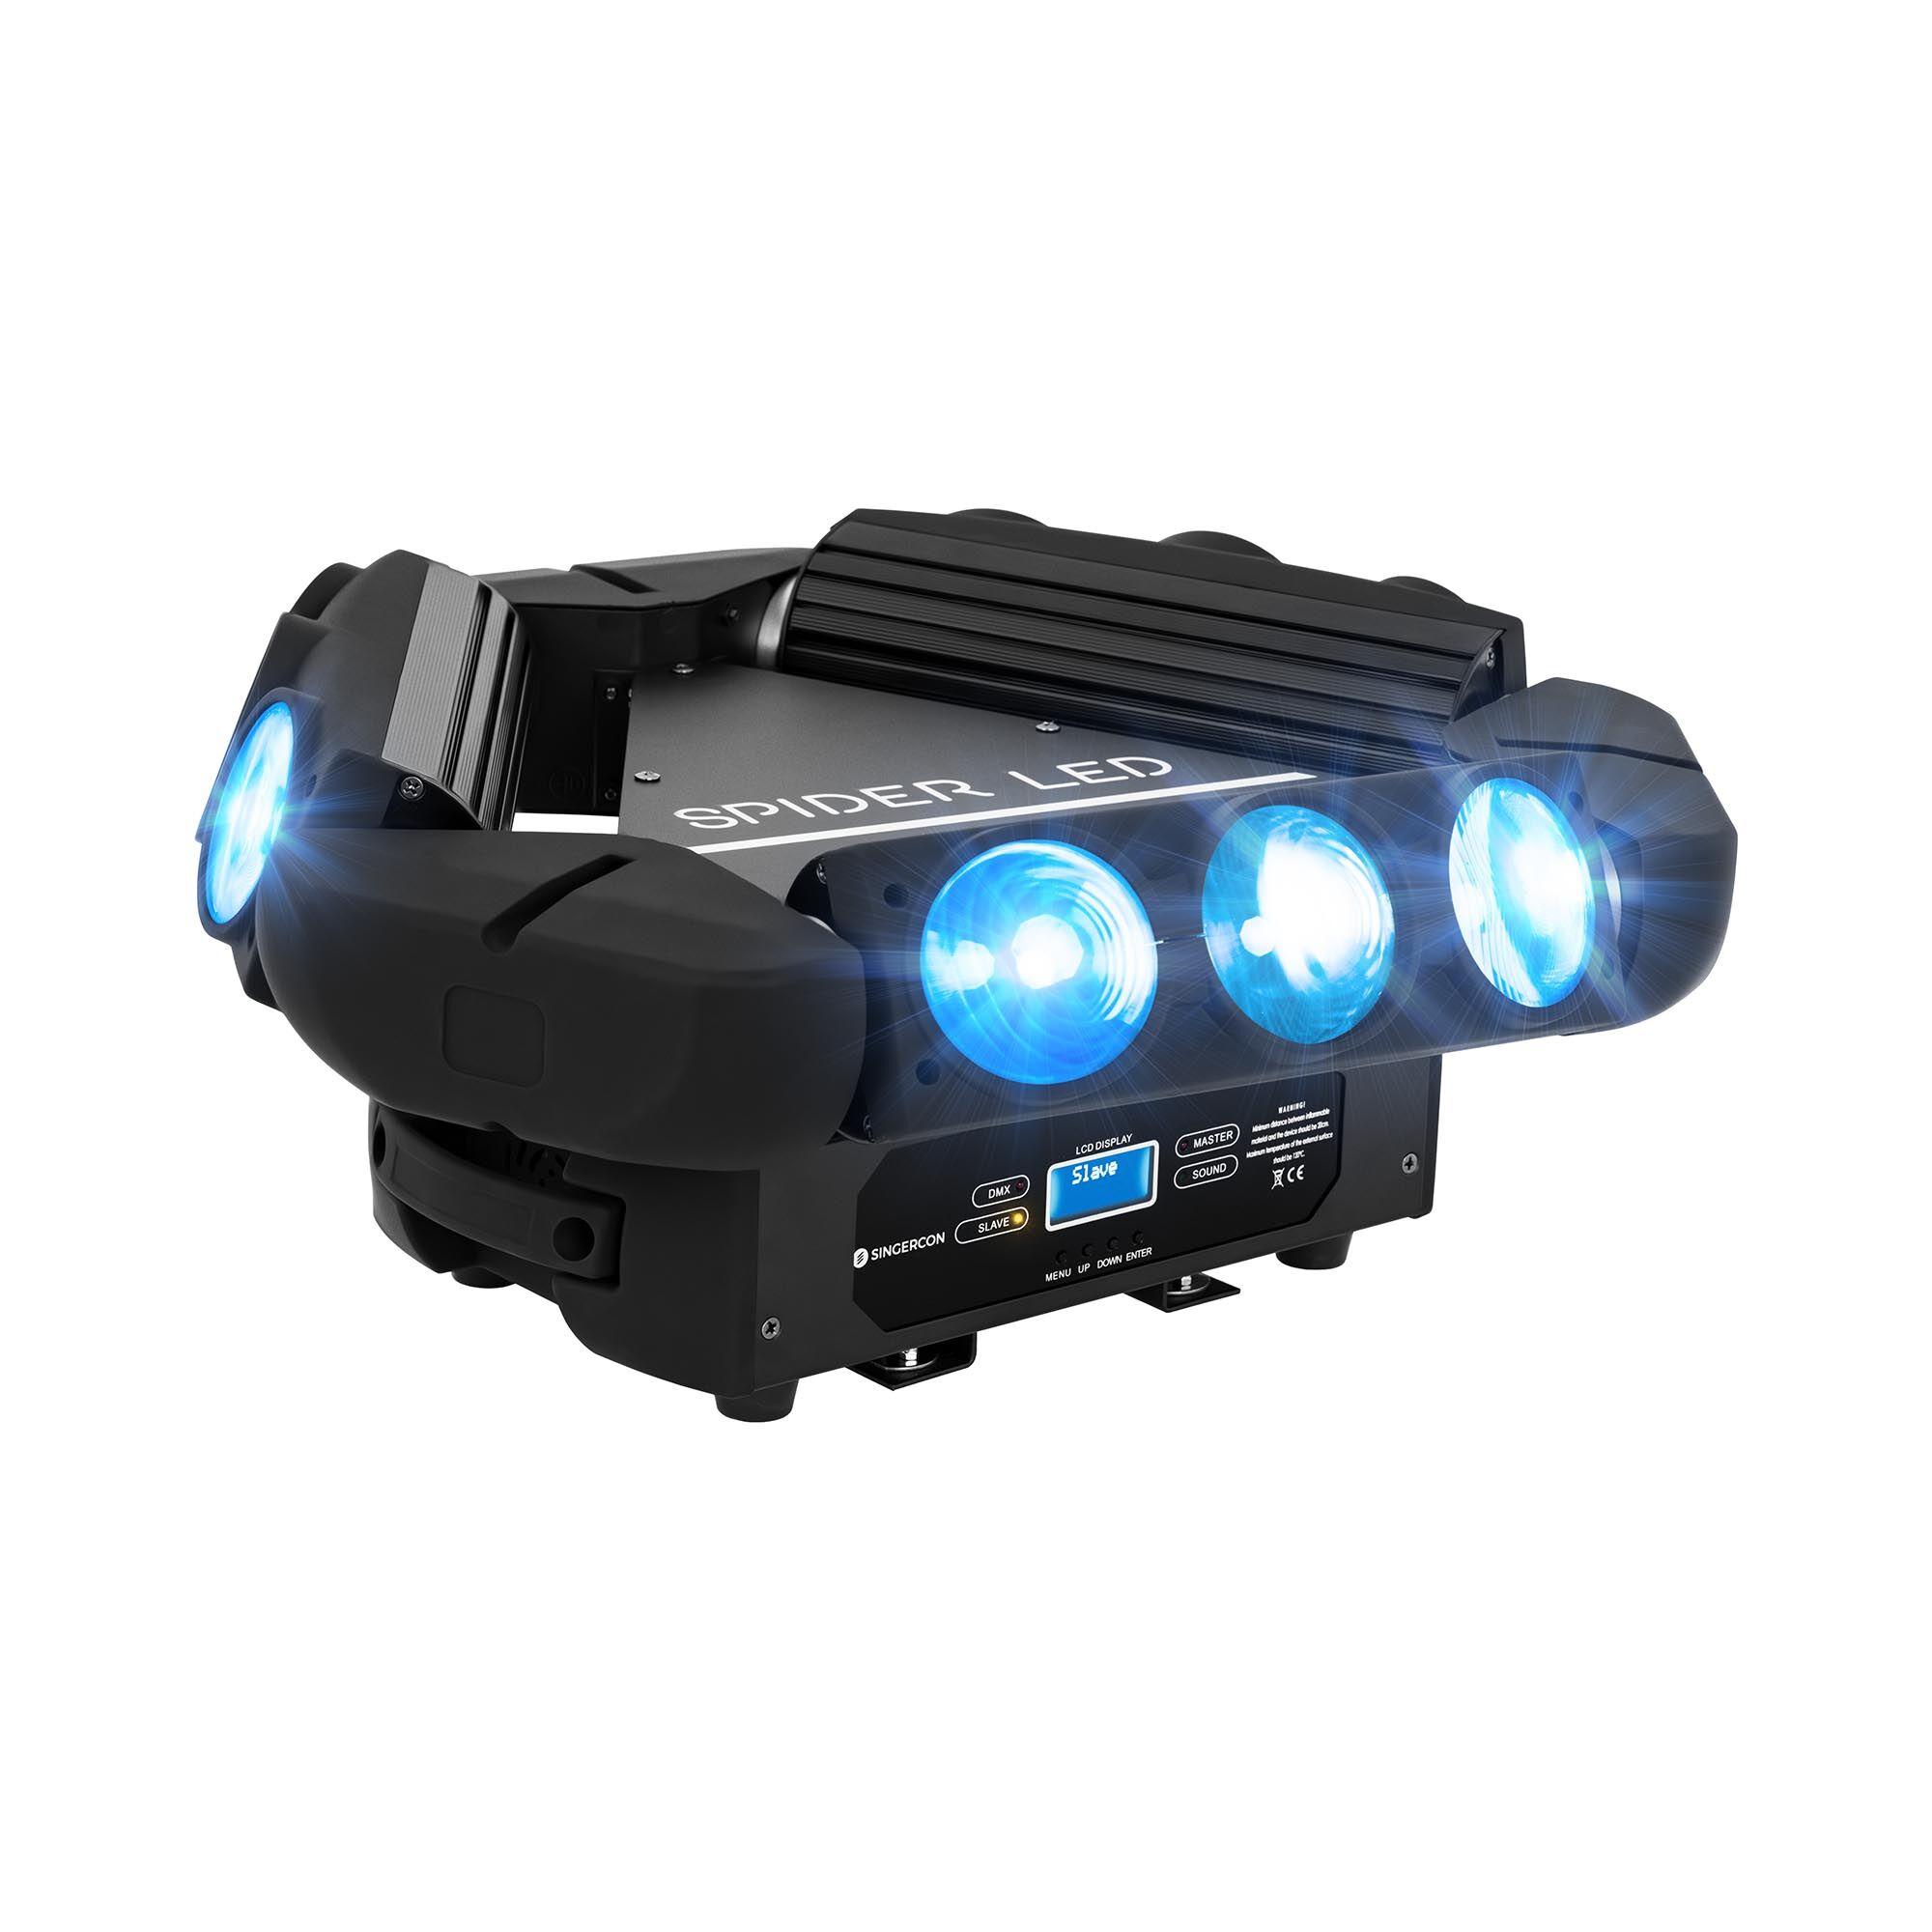 Singercon Moving head - 9 LED - 100 W CON.LMH-9/10/RGB